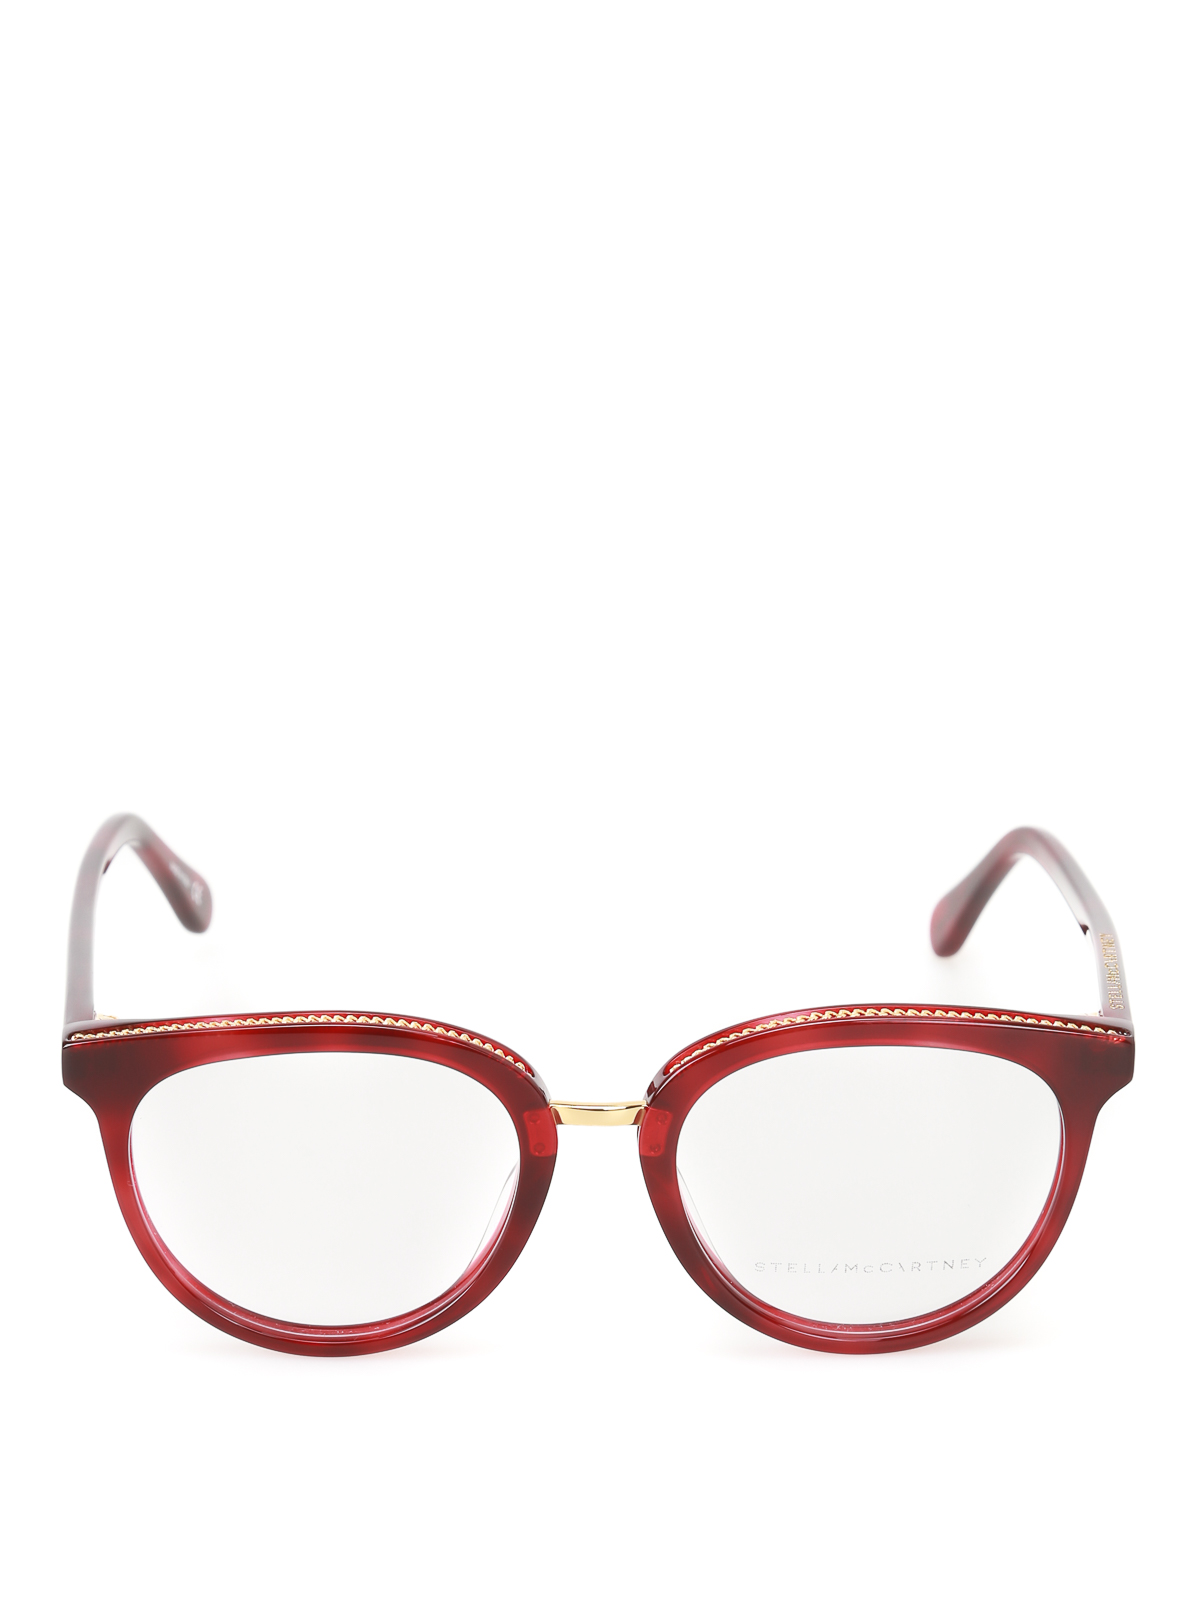 5634591949c iKRIX STELLA McCARTNEY  Glasses - Chain detailed dark red glasses